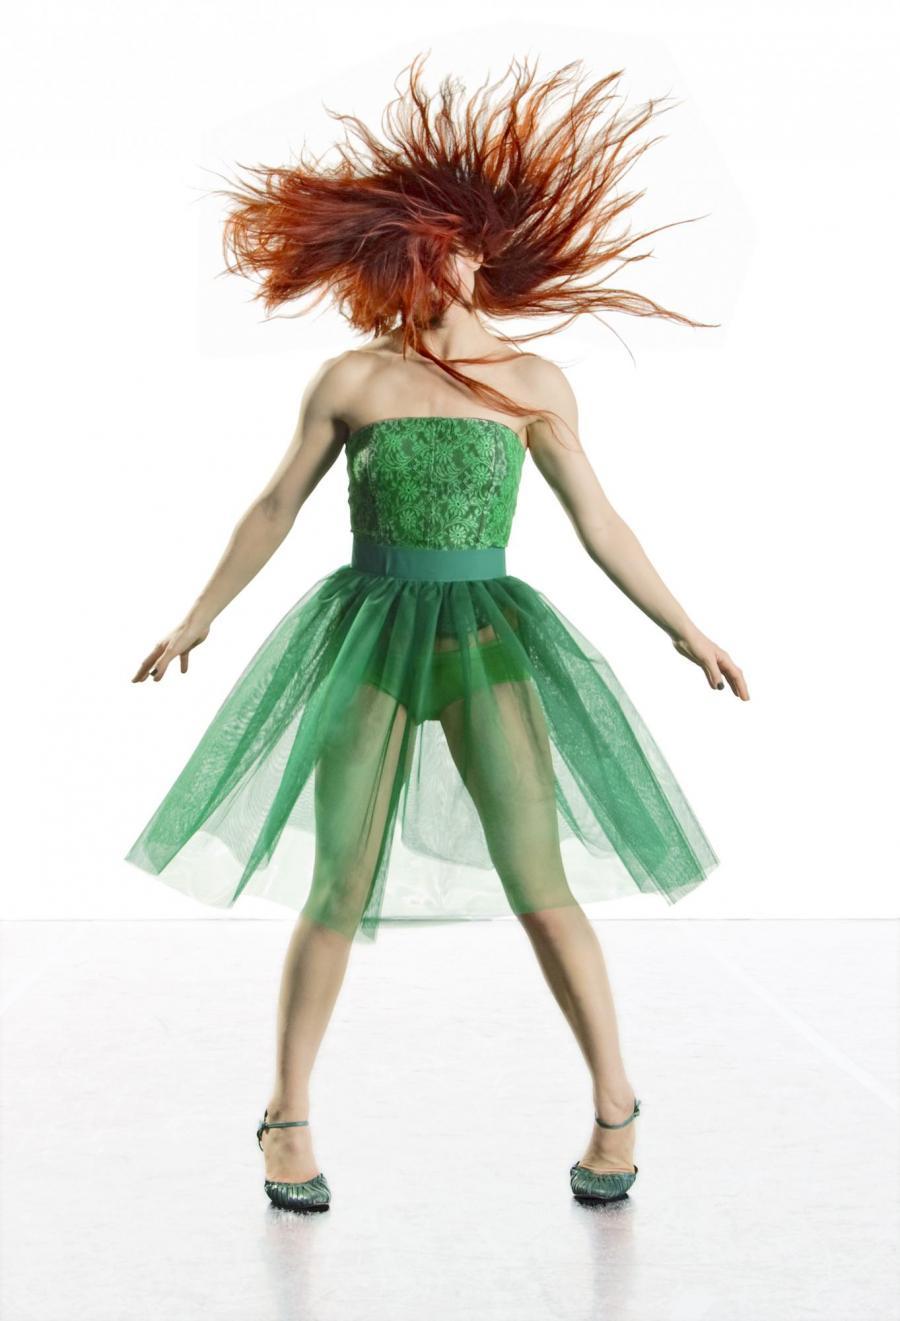 Australian Dance Theatre - G - photographer Chris Herzfeld.jpg